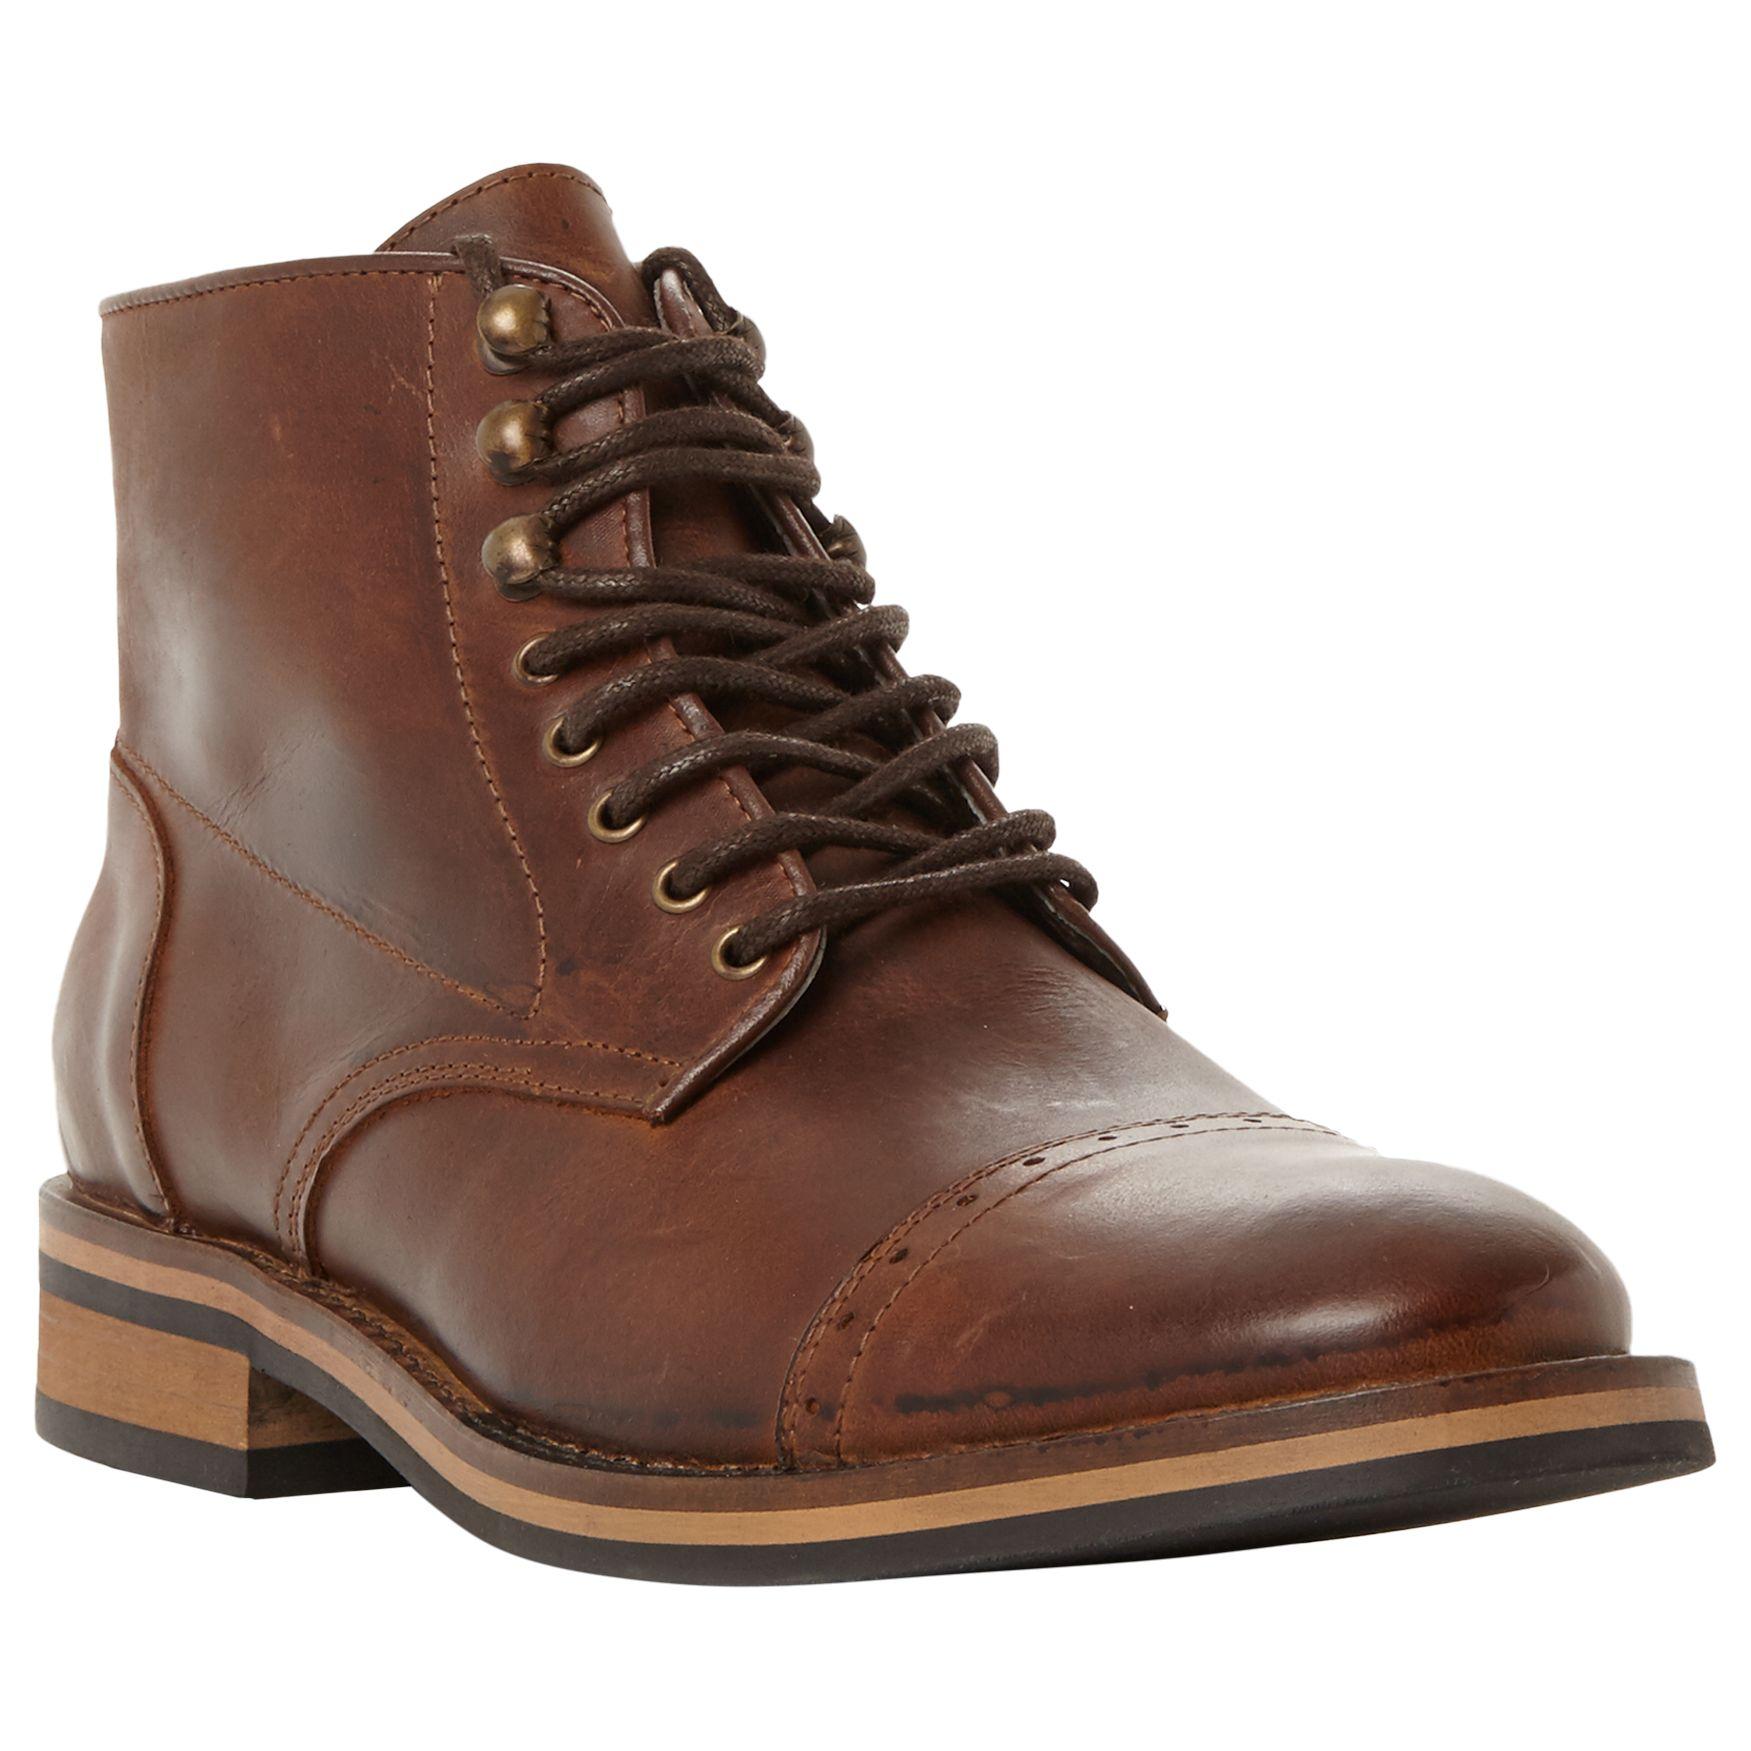 Bertie Bertie Charli Toecap Detail Lace-Up Leather Boots